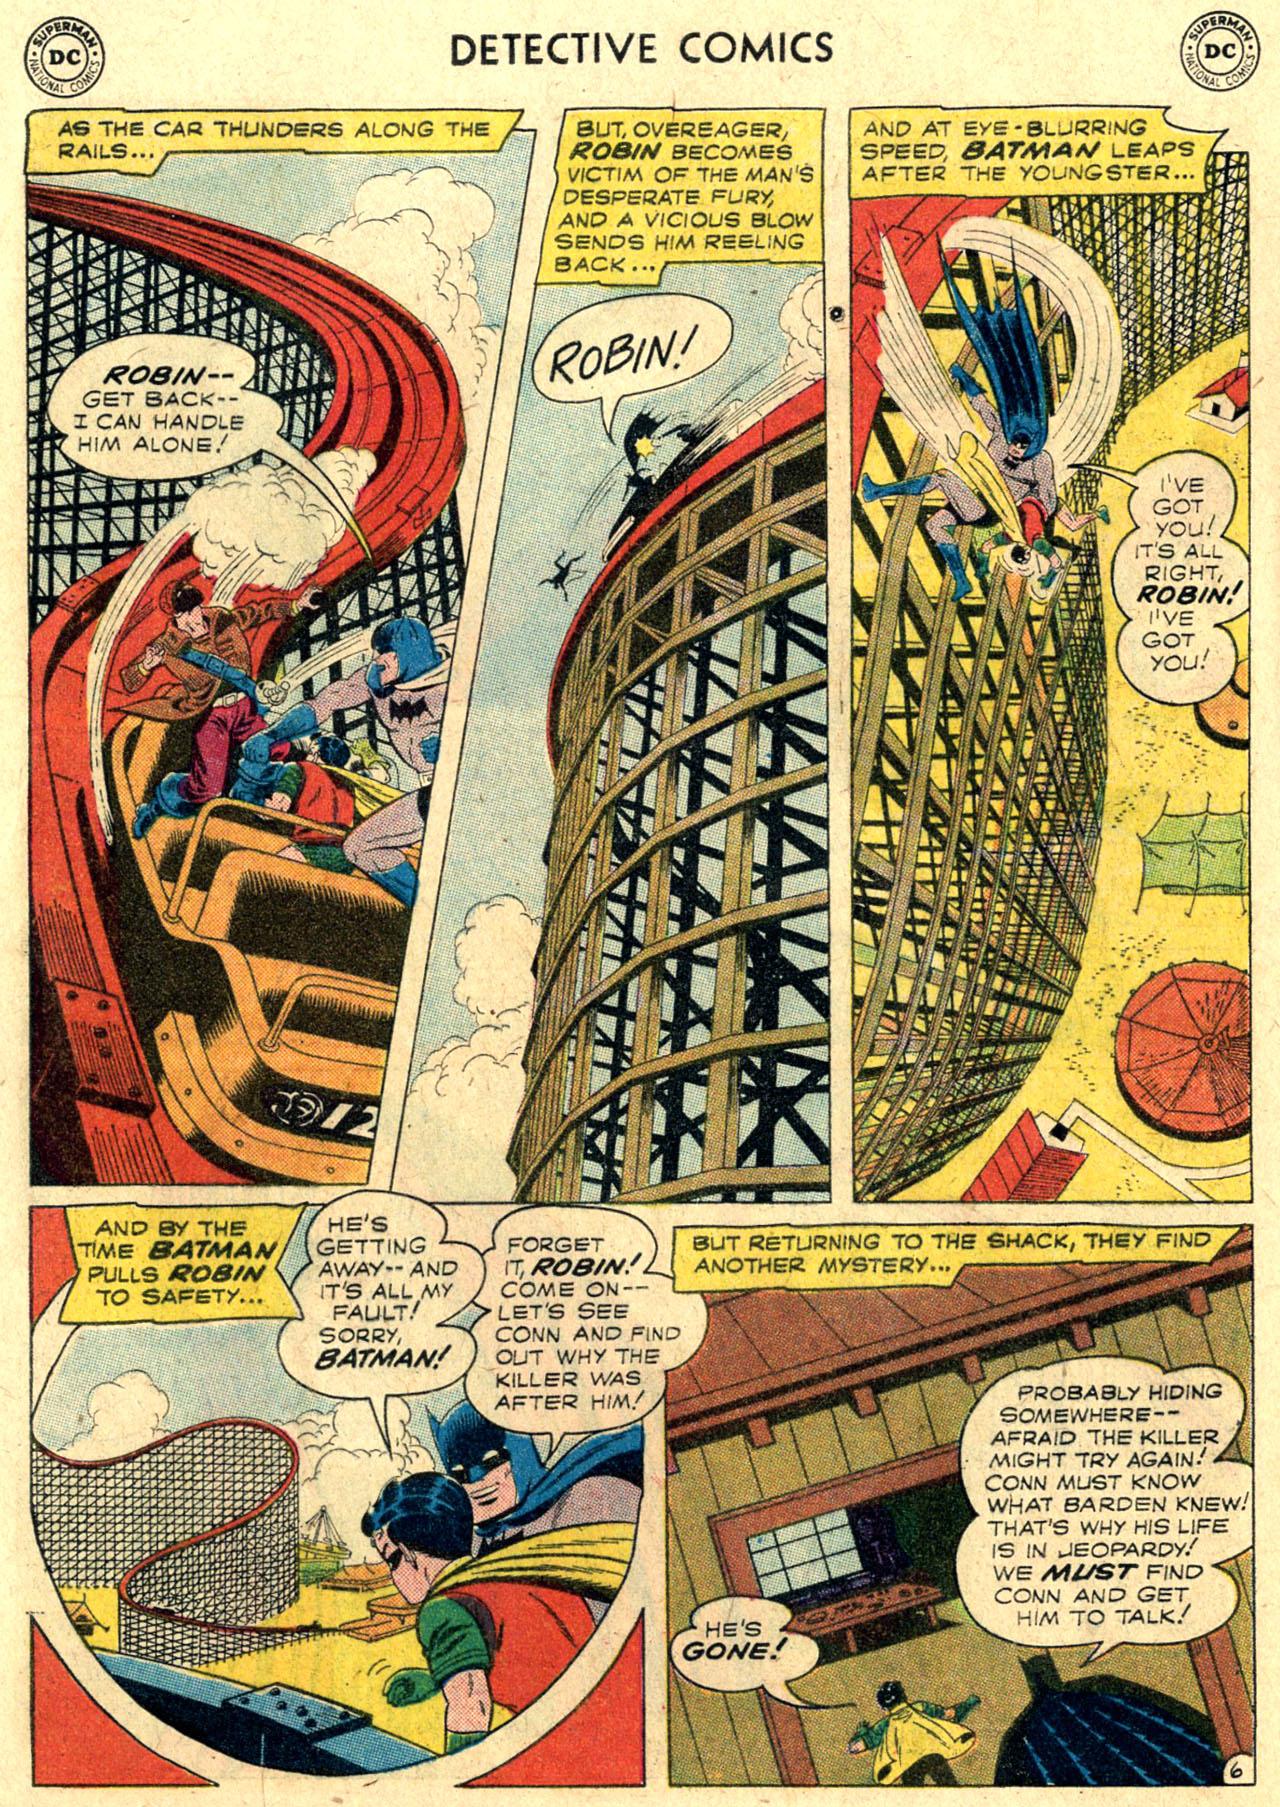 Detective Comics (1937) 264 Page 7